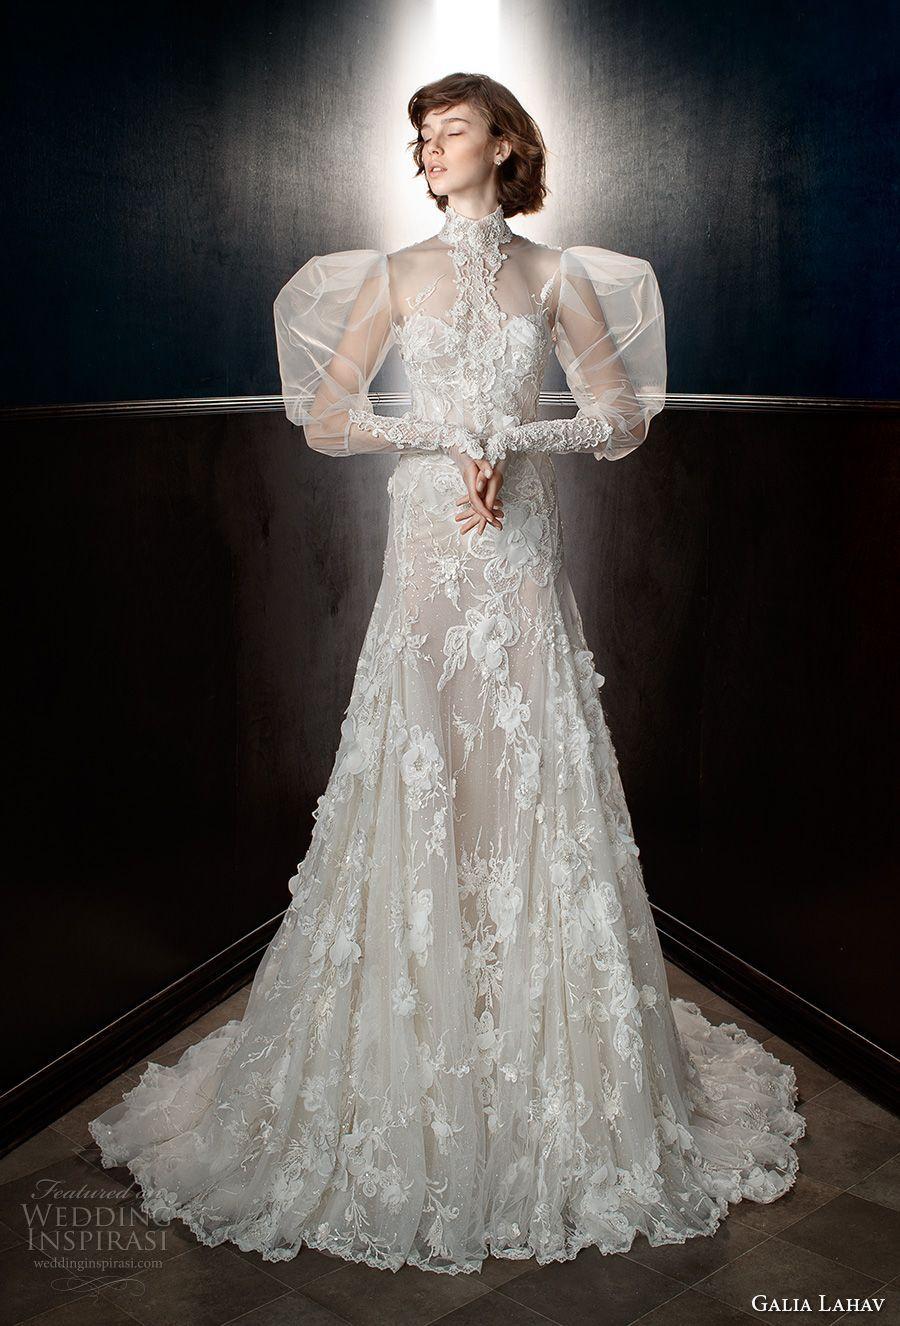 Galia lahav spring bridal puffed long sleeves high neck